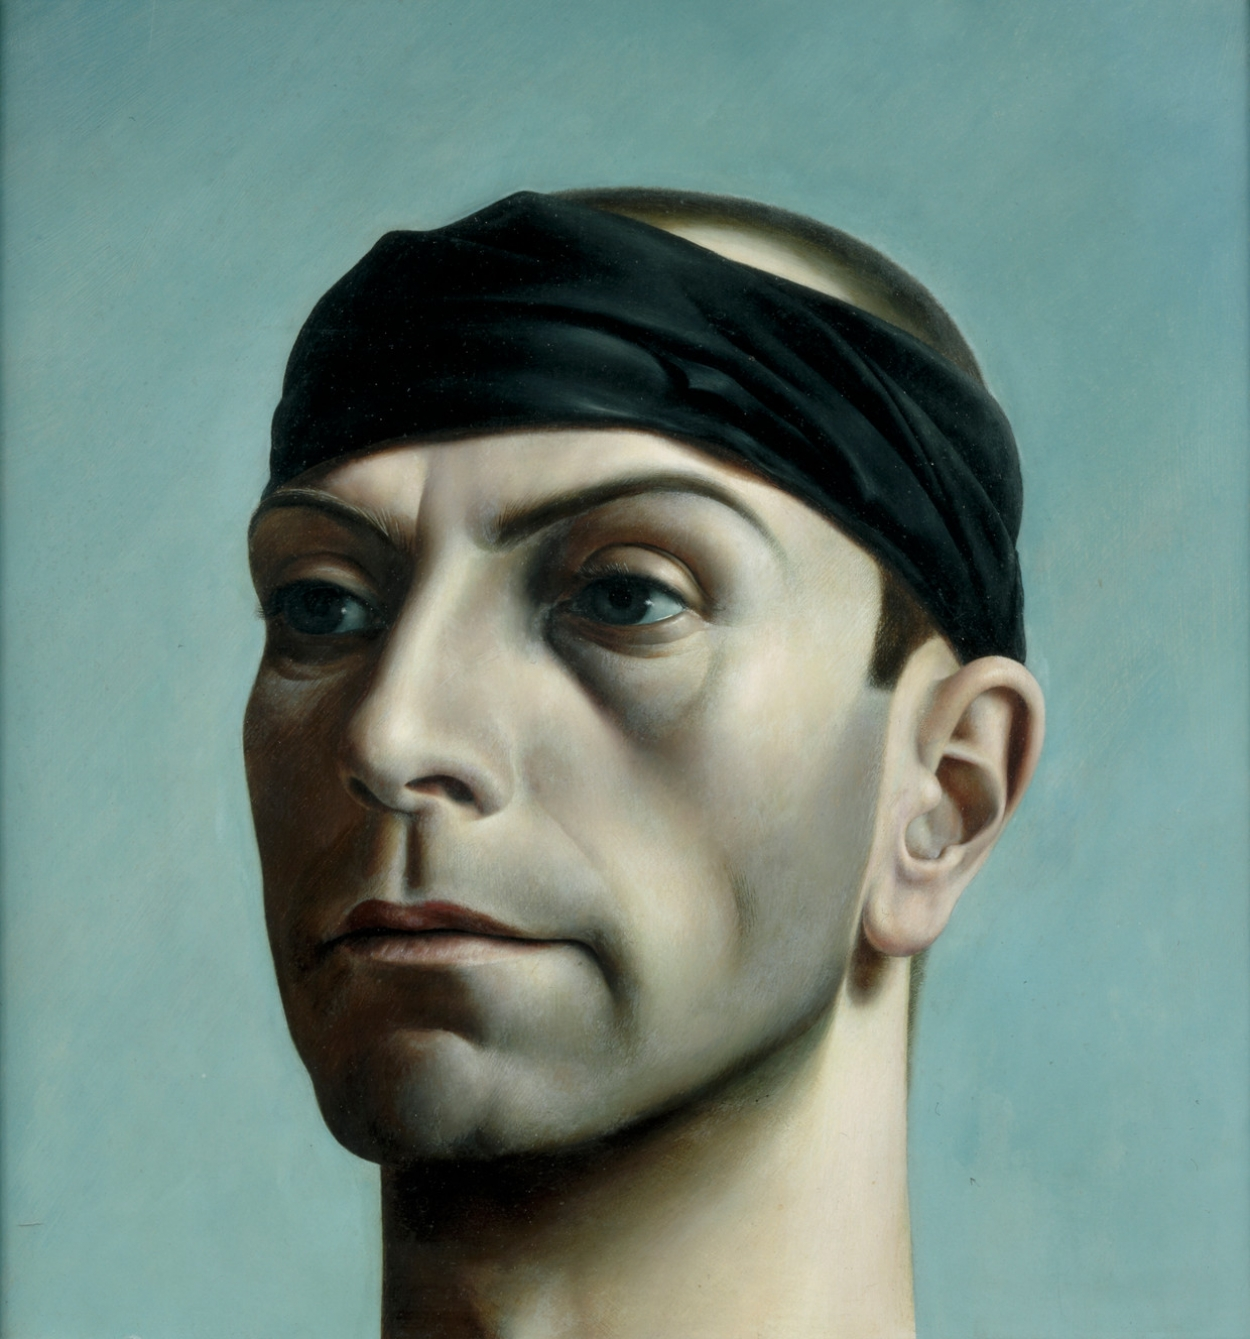 zelfportret-met-zwarte-band-pyke-koch.jpg